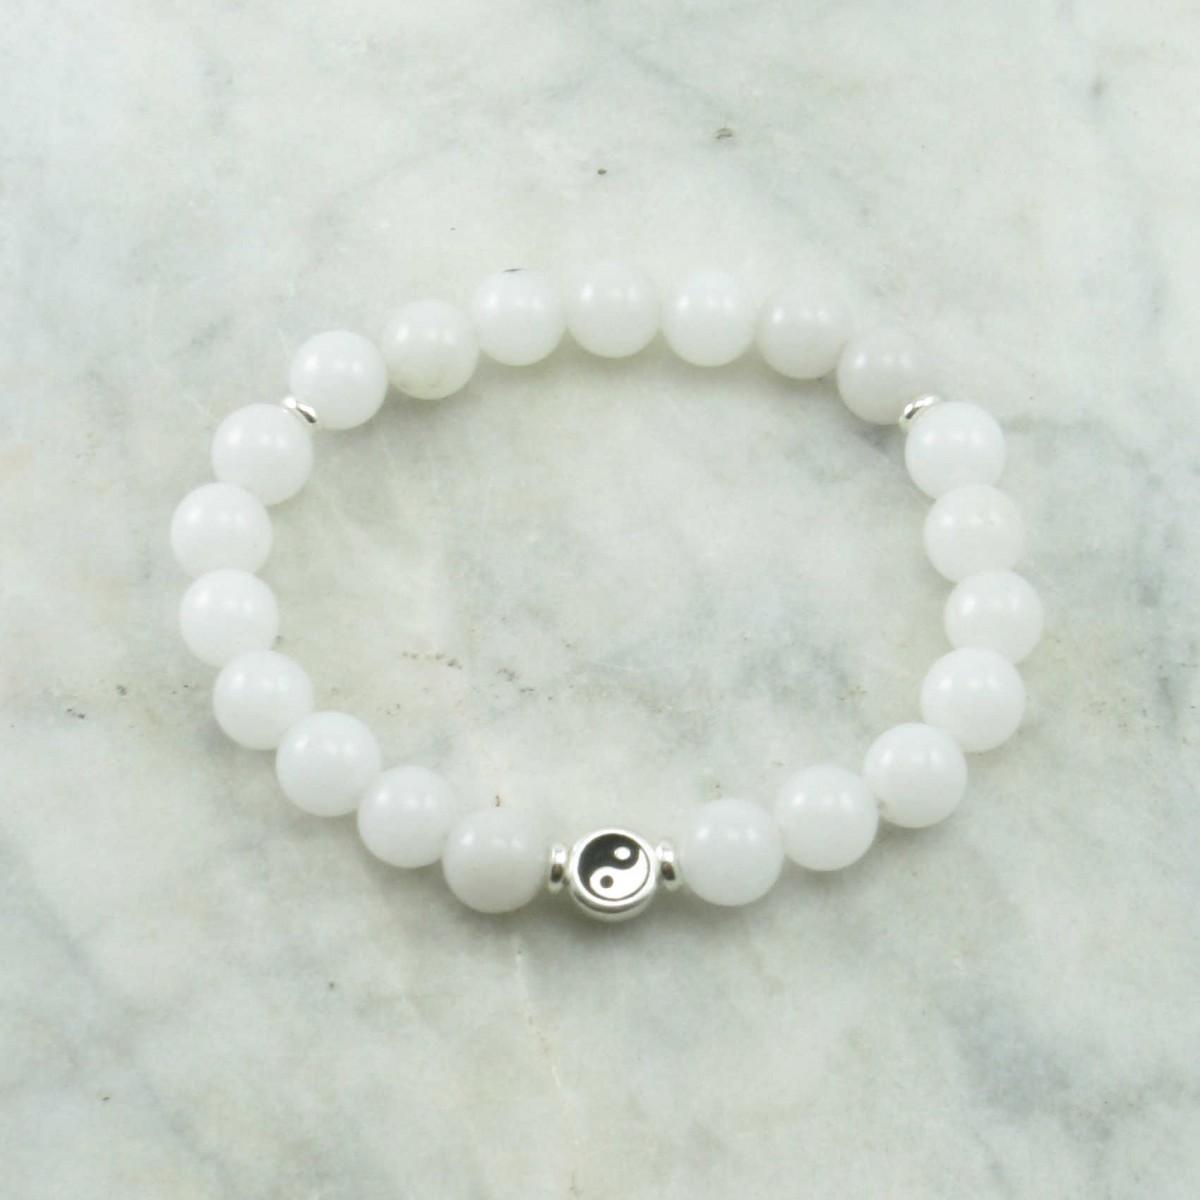 Ying_Yang_Mala_Beads_White_Quartz_Mala_Bracelet